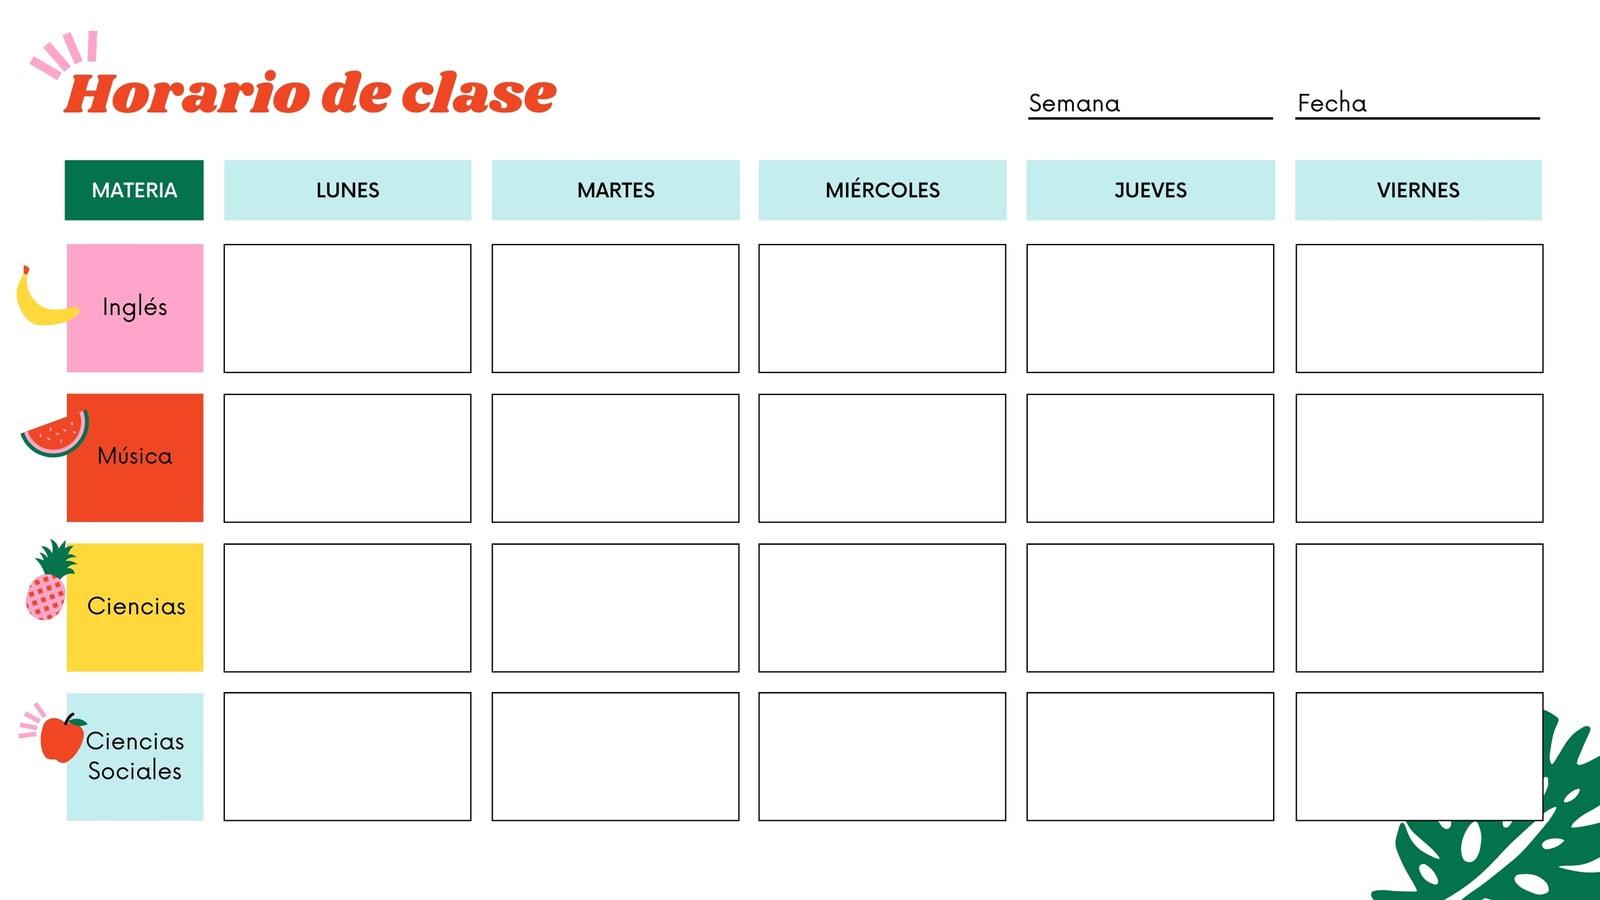 Colorido Ilustrado Formato para Imprimir Calendario Semanal de Clases